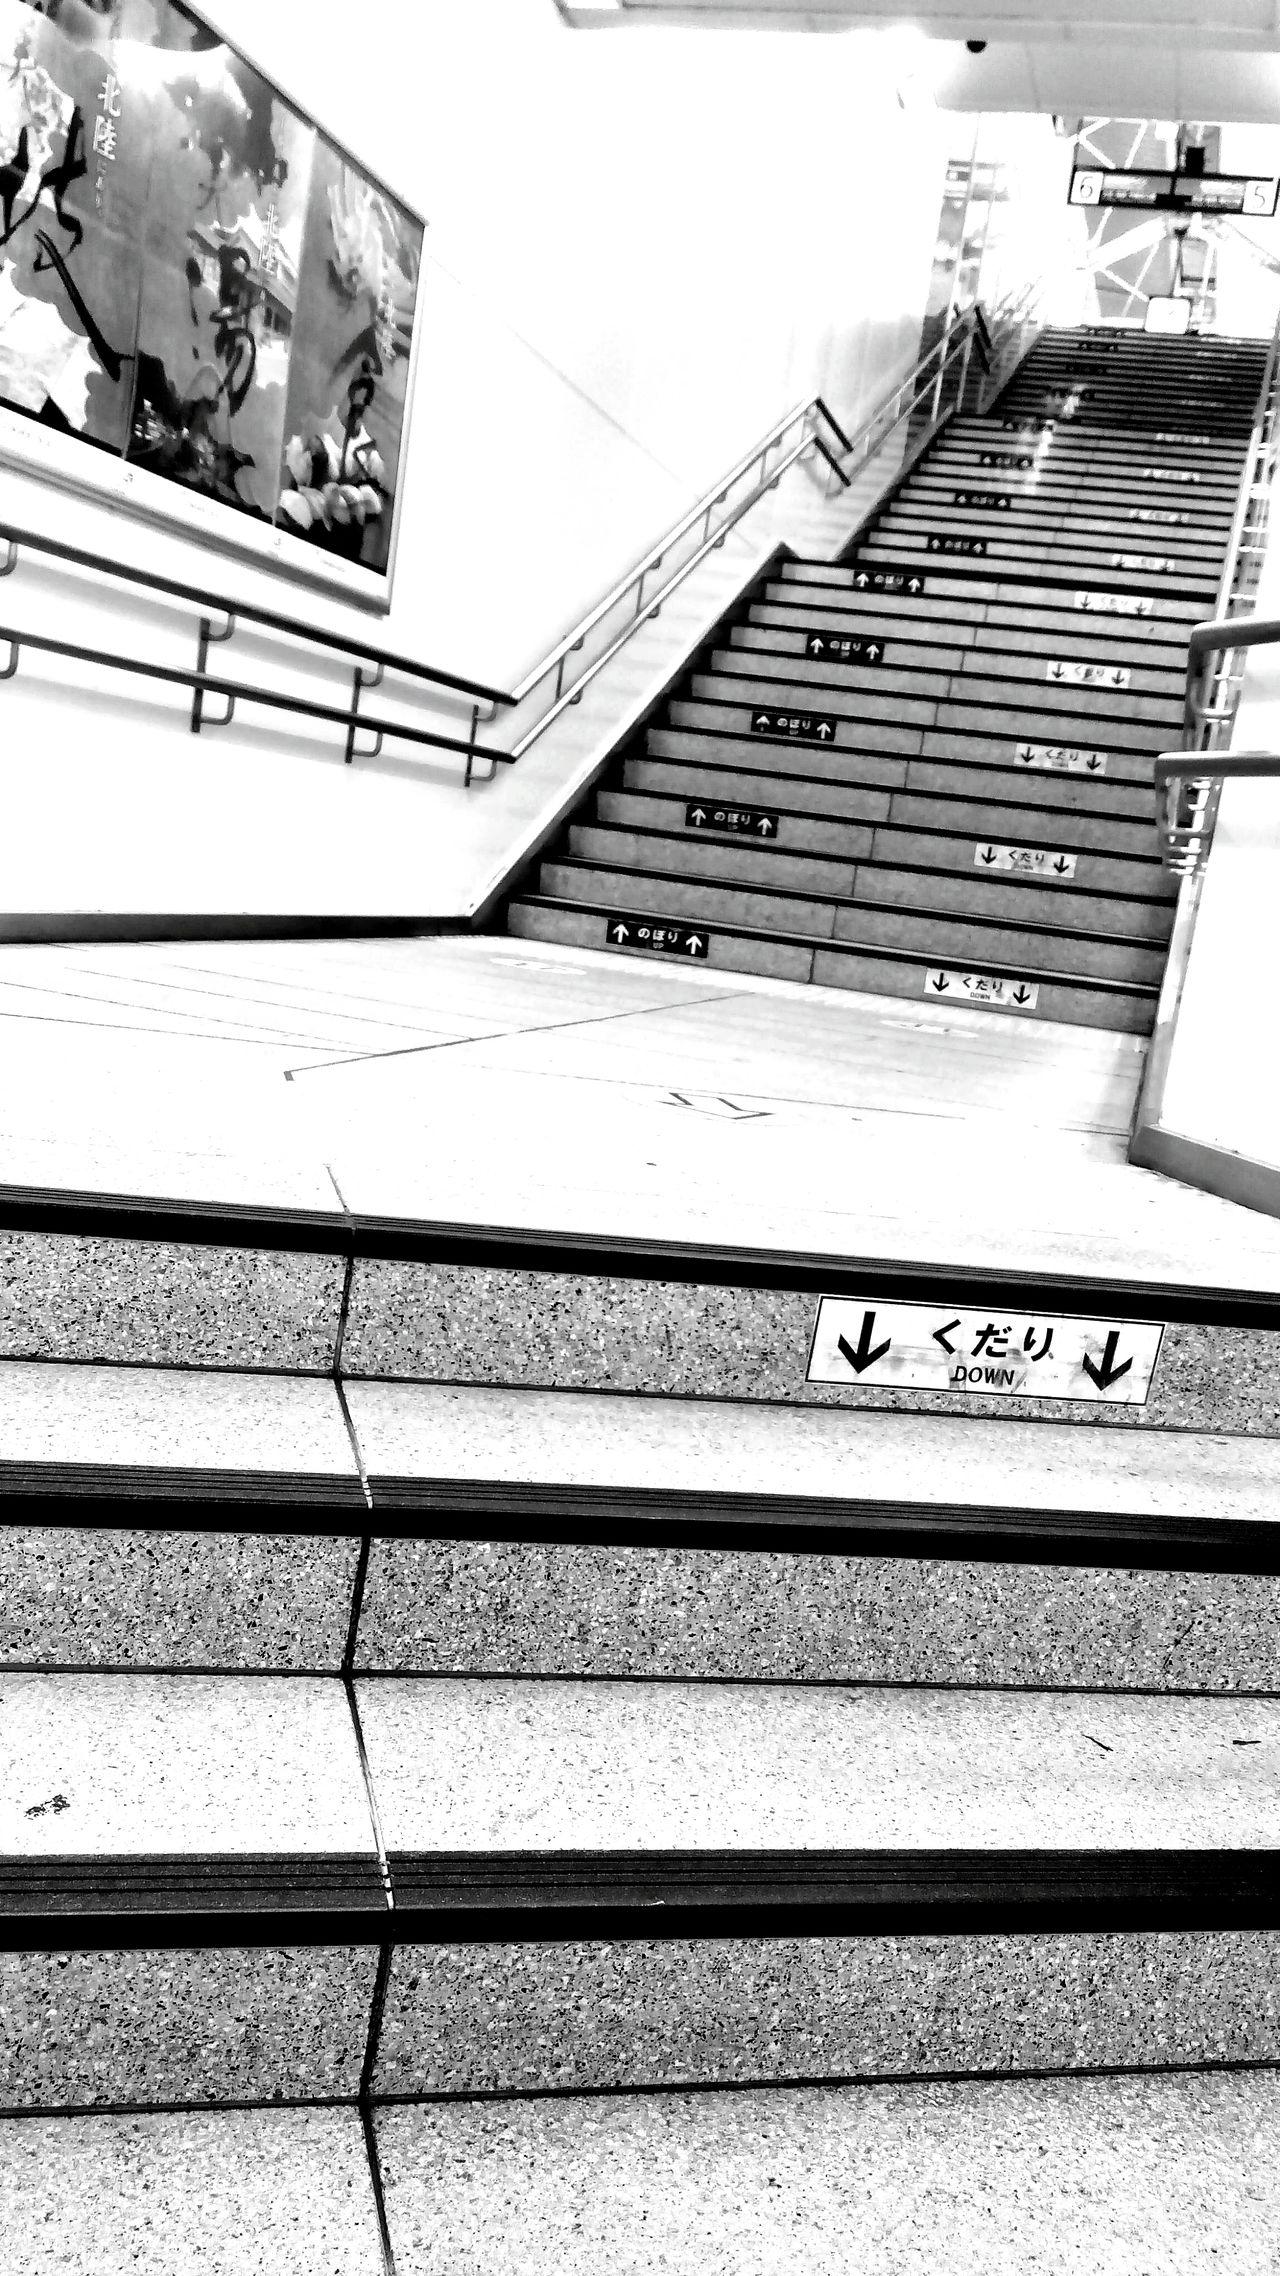 Black And White Monochrome Train Station Stears No One